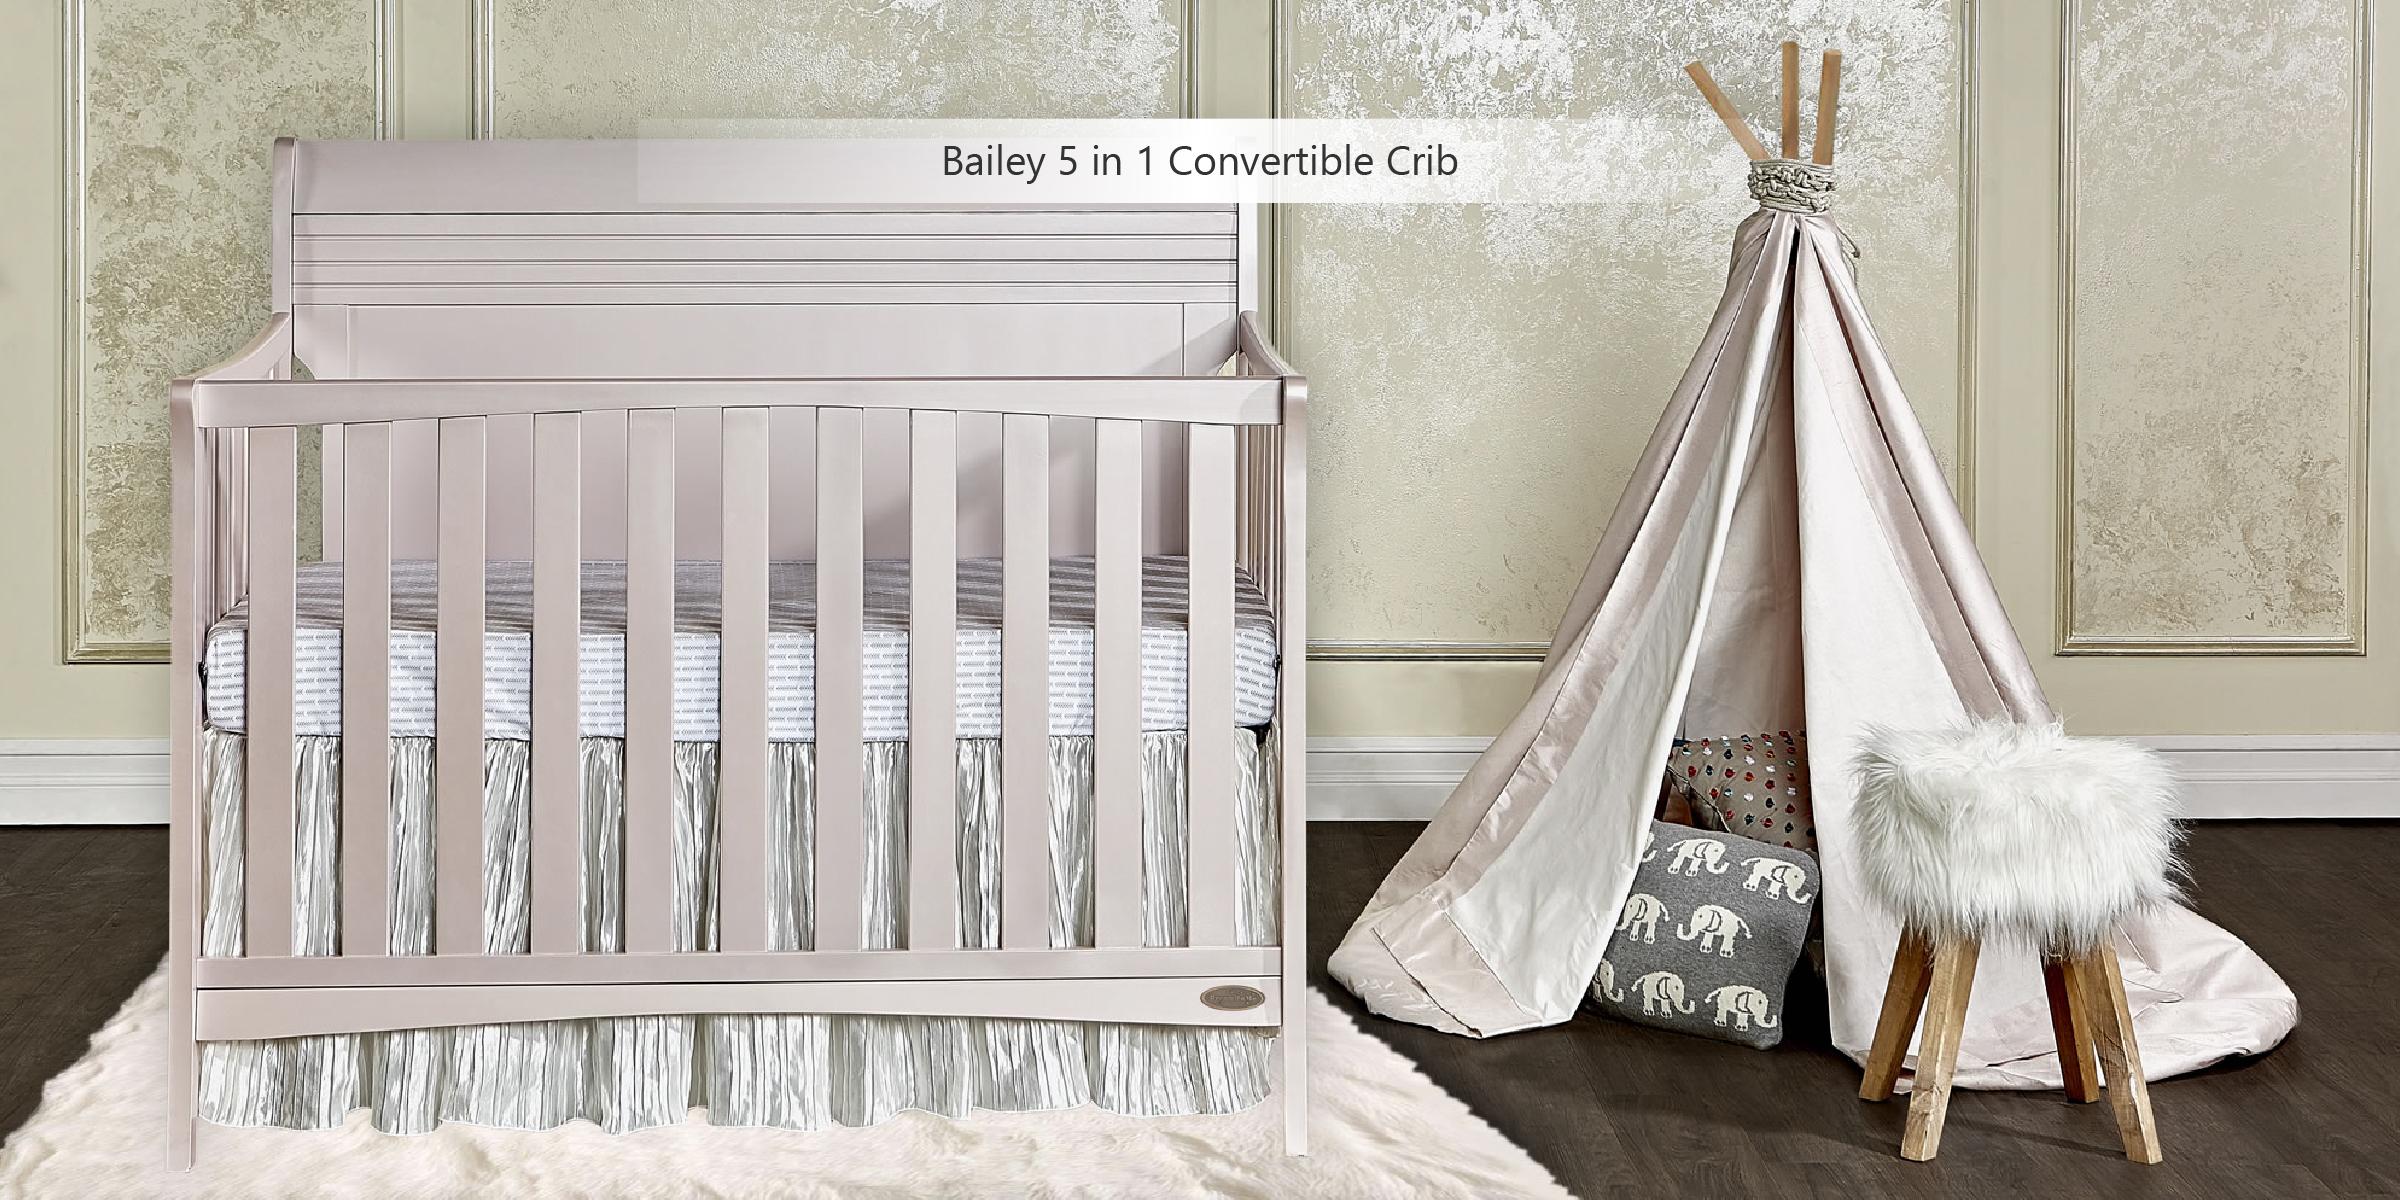 Bailey-5-in-1-Convertible-Crib